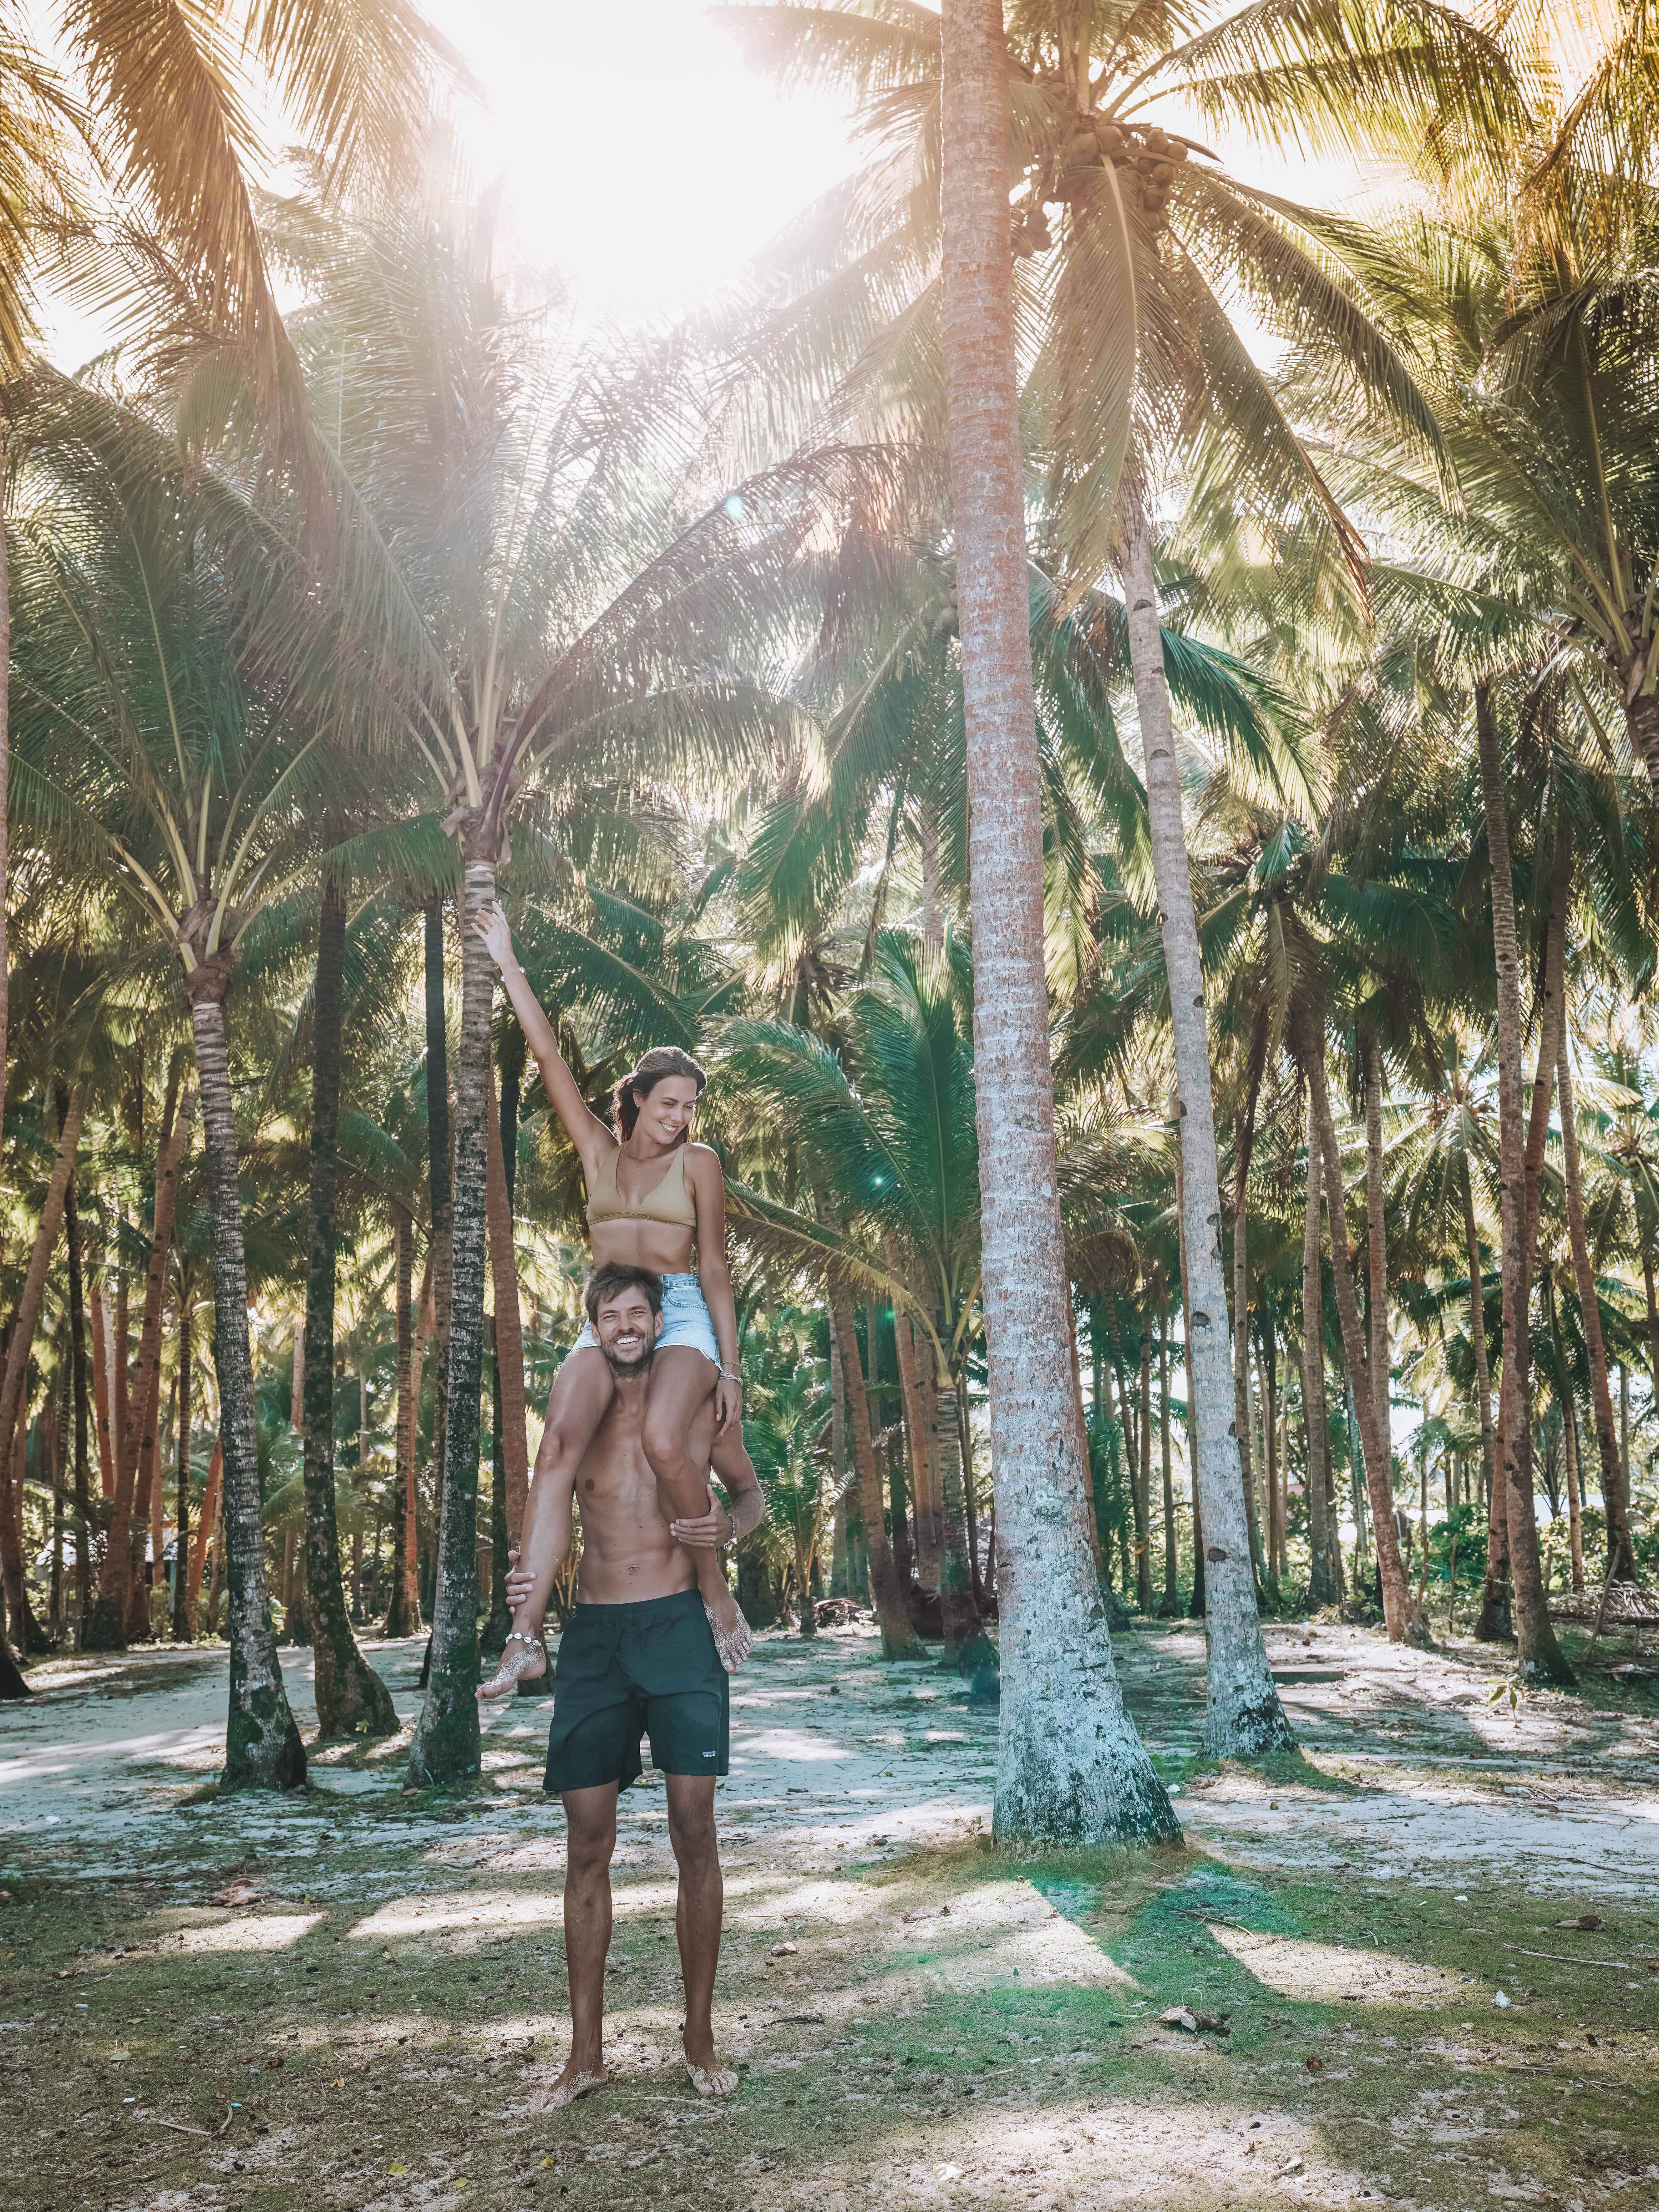 Siargao Alegria Beach Palm Trees Couple